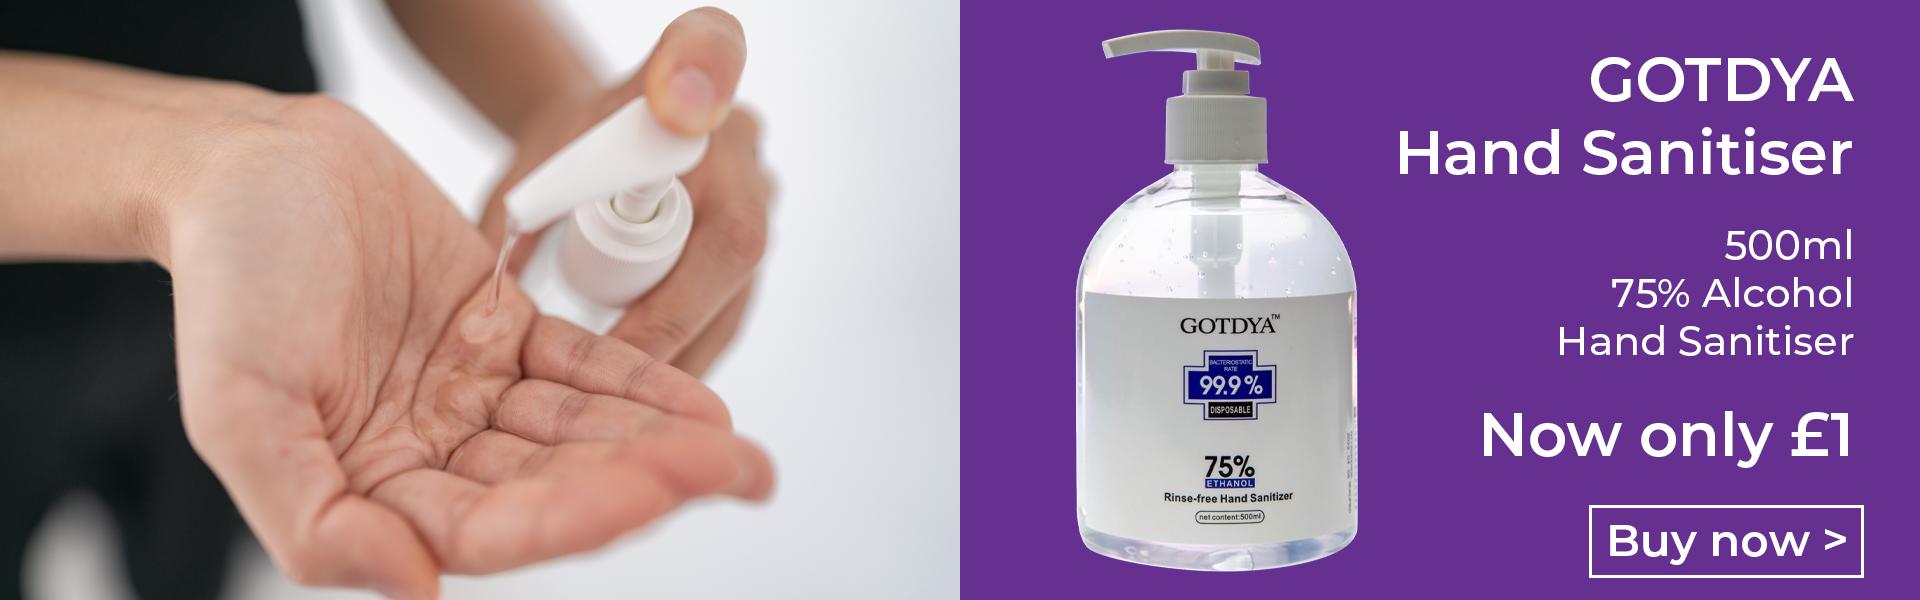 Gotdya 500ml Hand Sanitiser 70% alcohol - Only \u00a31!